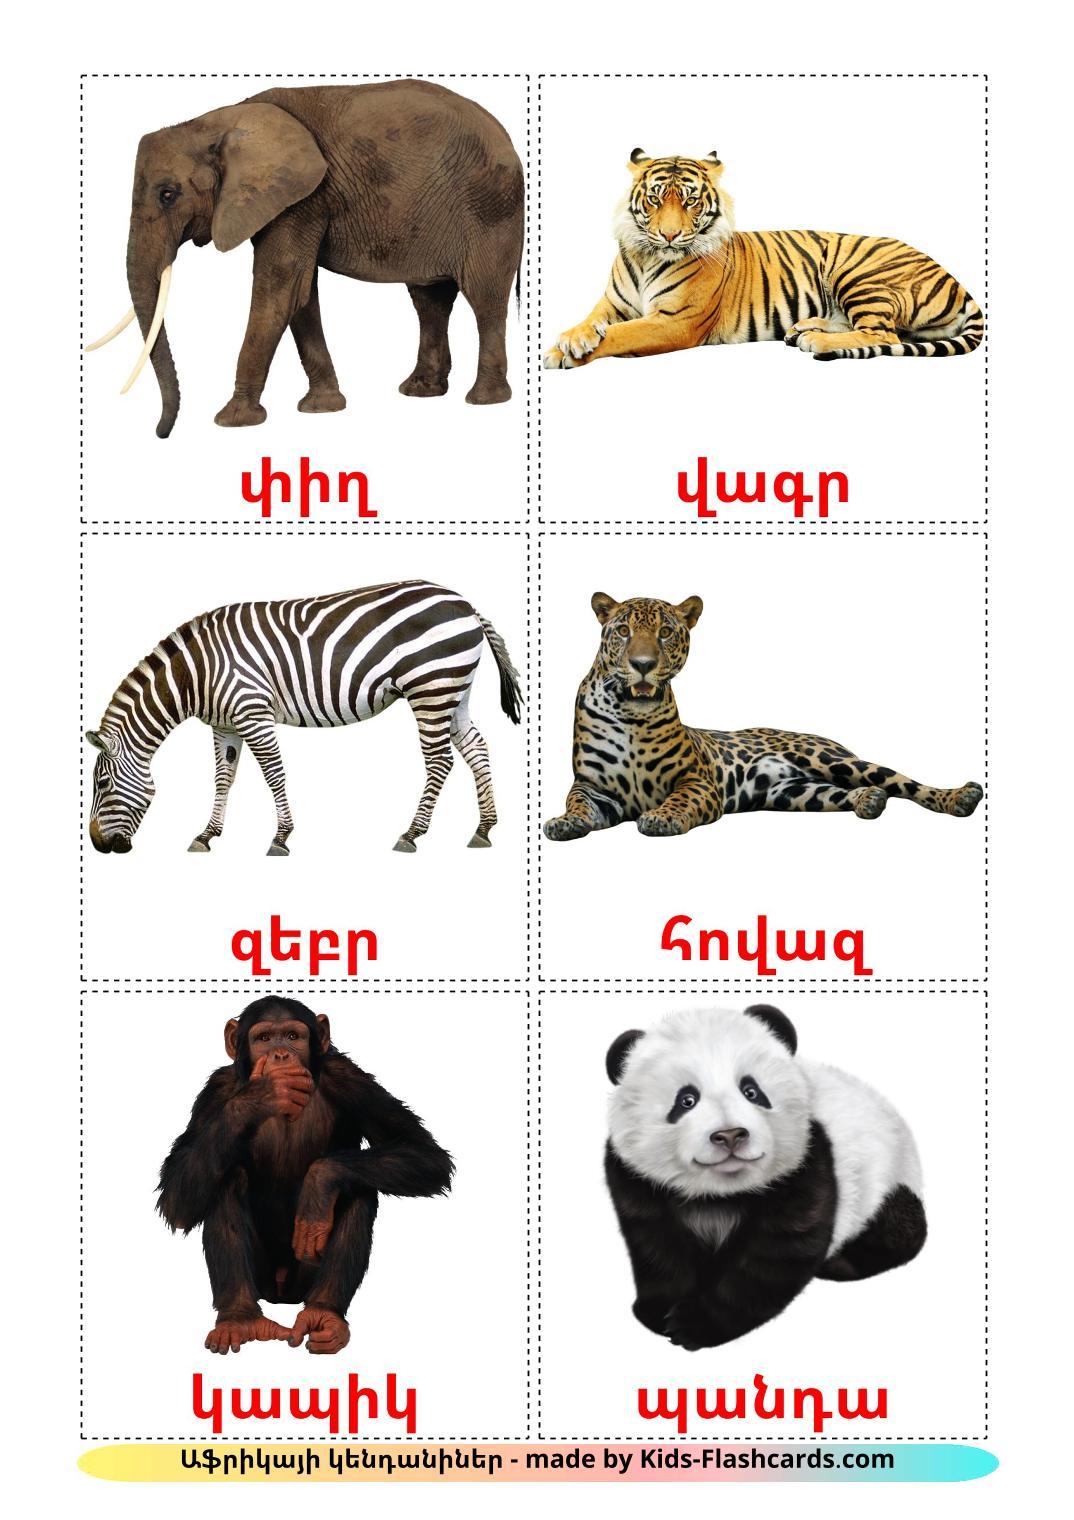 Jungle animals - 21 Free Printable armenian Flashcards